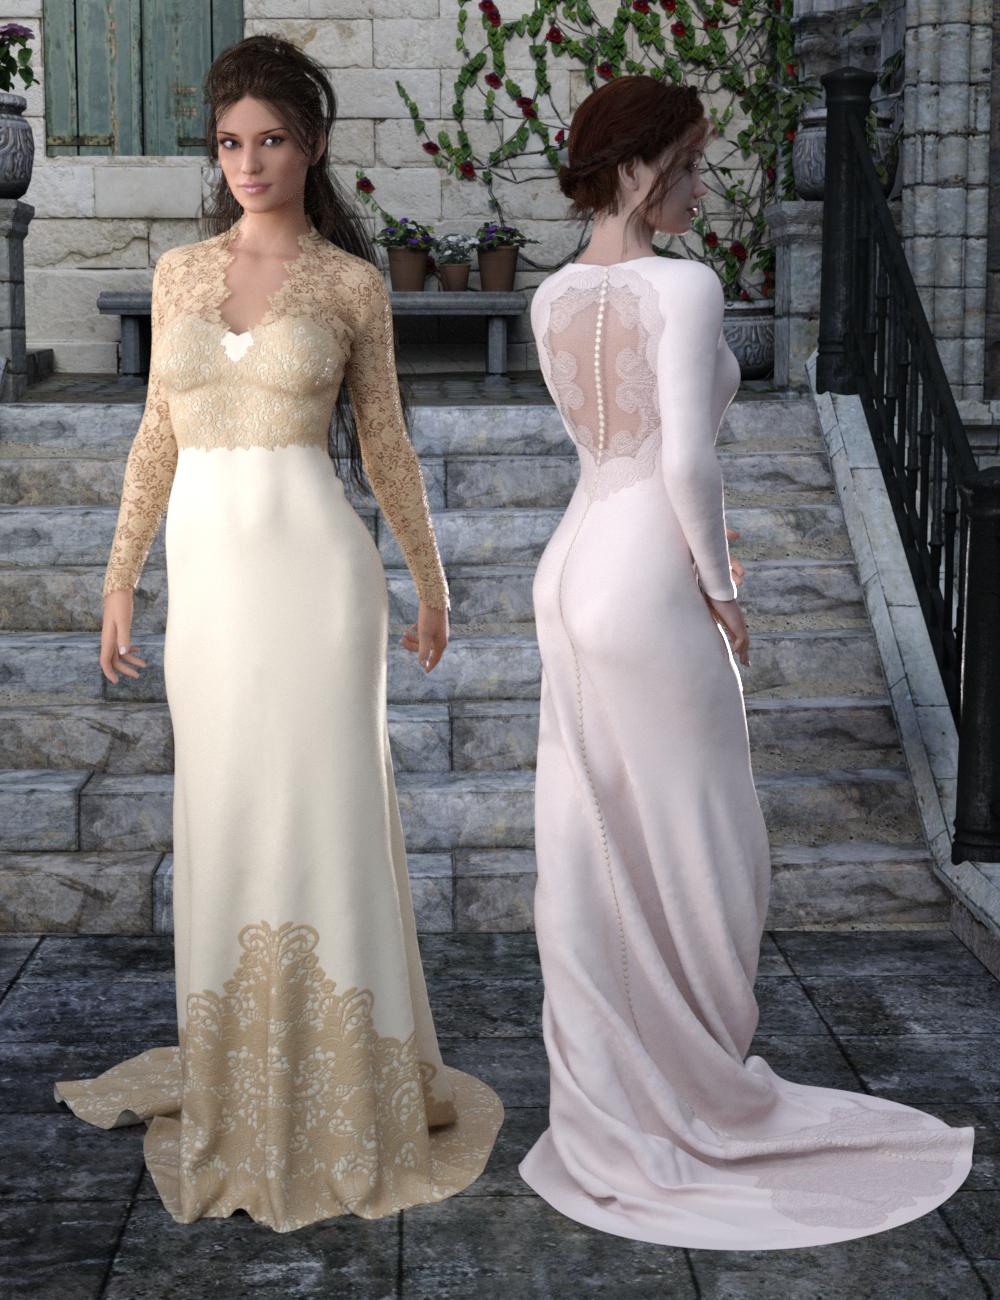 Bridal Styles for Trumpet Dress by: IDG DesignsDestinysGarden, 3D Models by Daz 3D